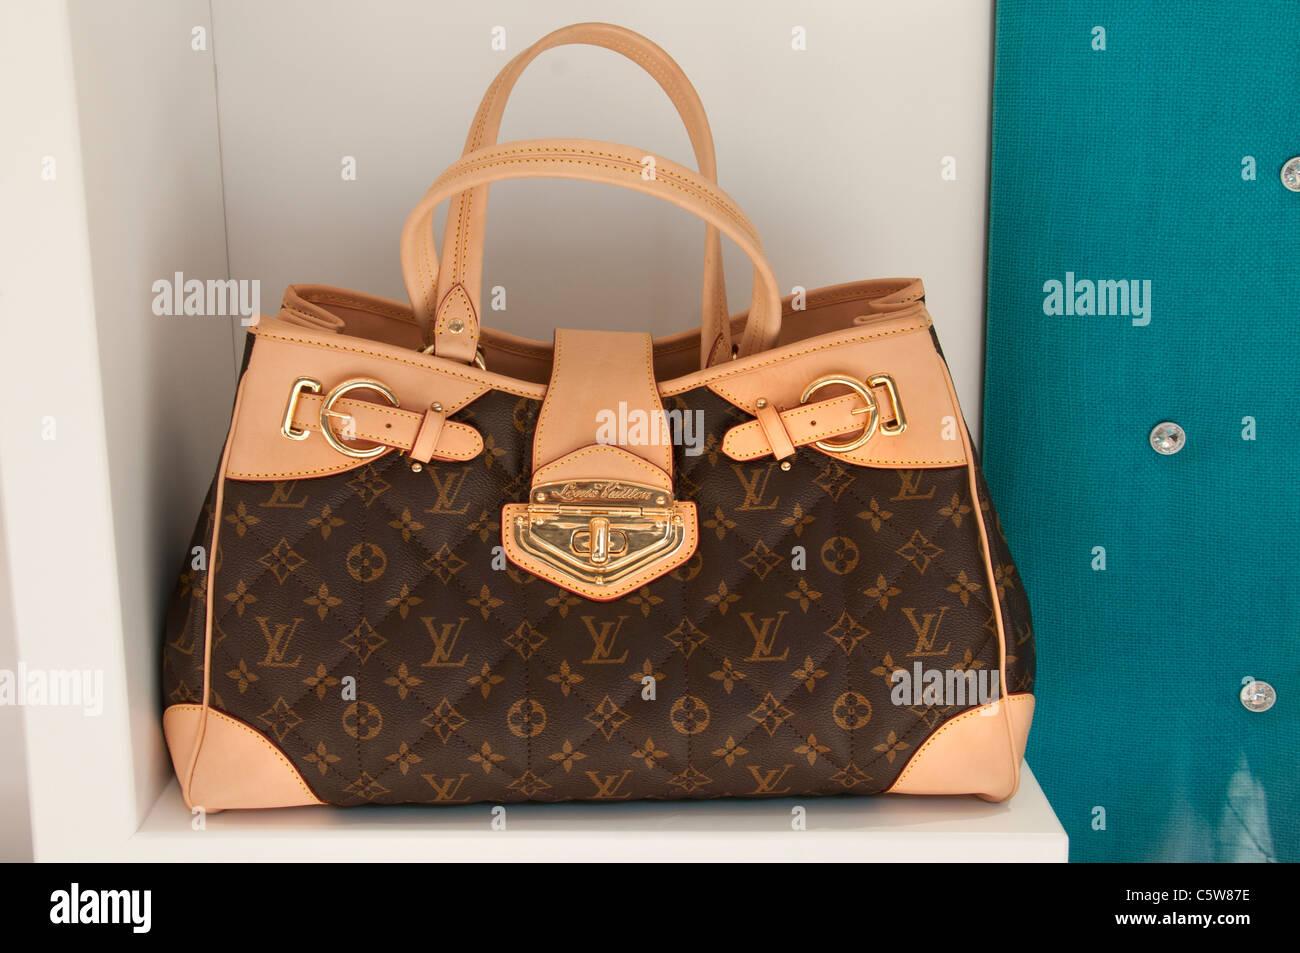 Louis Vuitton  mock fake imitation forgery sham bag bags Turkey Turkish - Stock Image